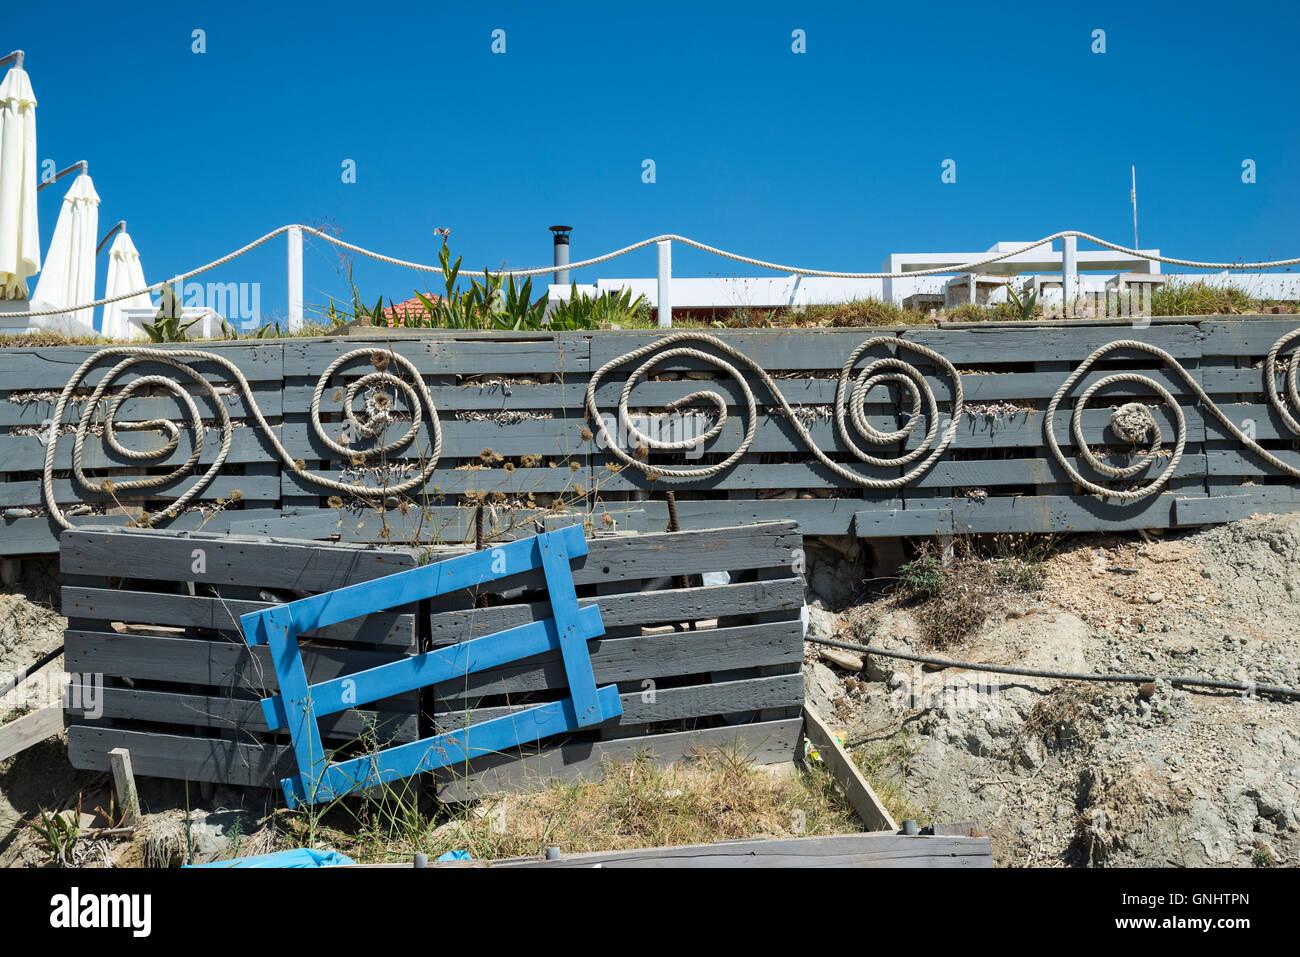 Xi beach, Kefalonia, Ionian Islands, Greece, Europe - Stock Image